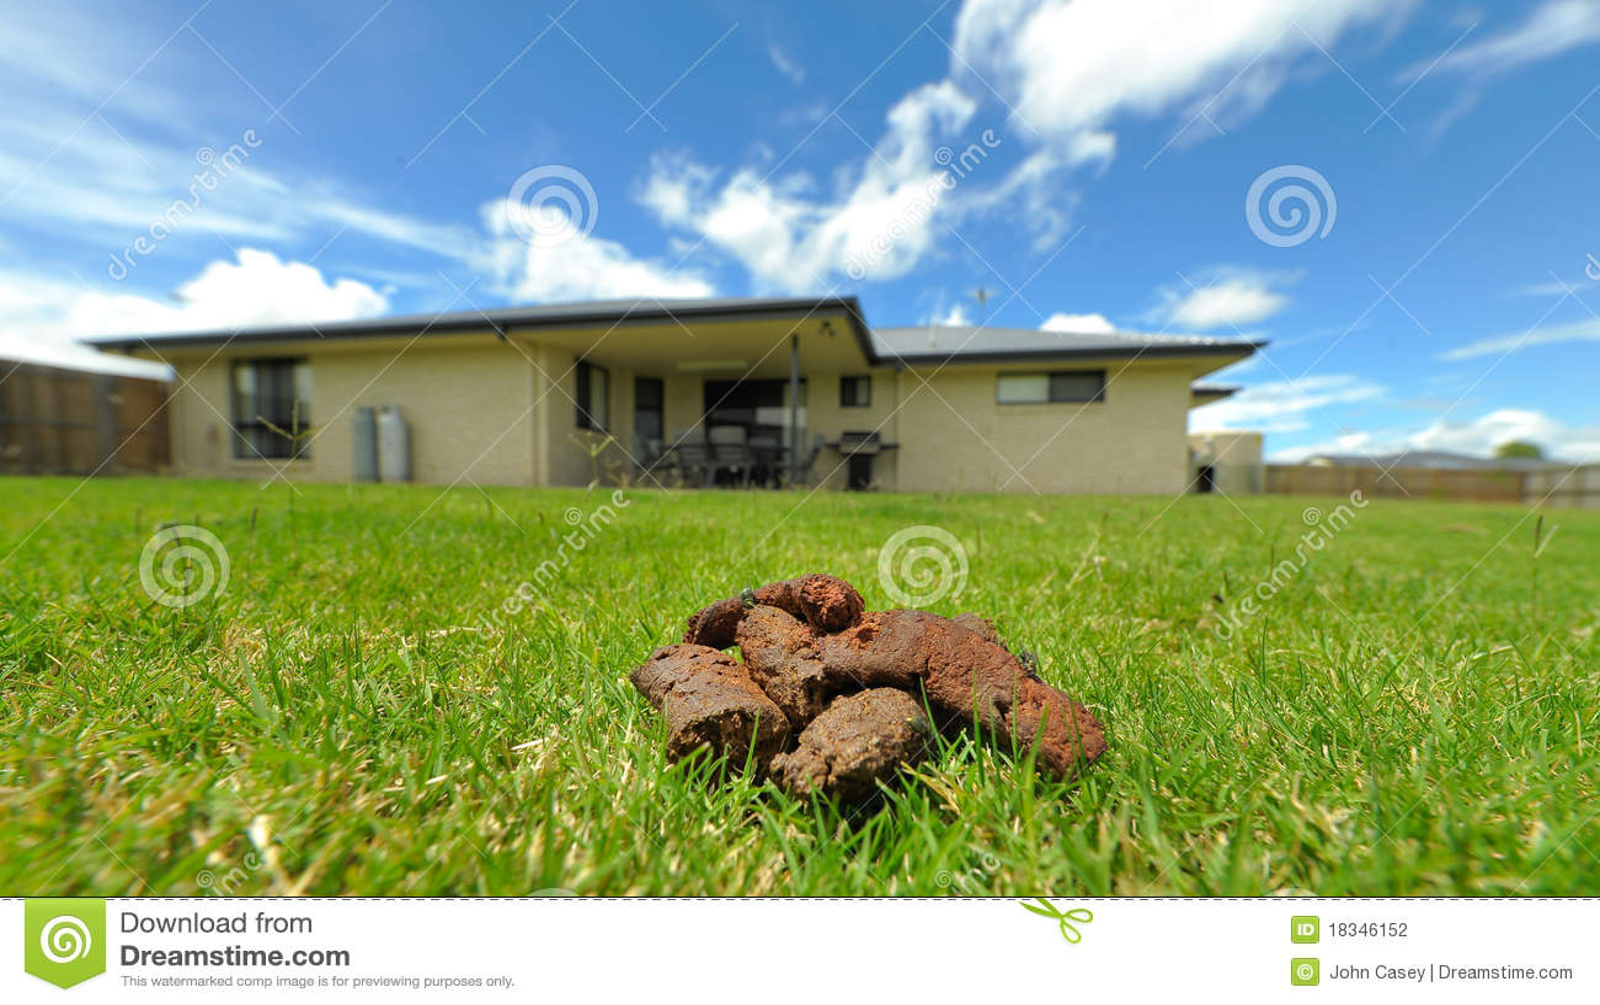 Dog Poo In Backyard Stock Photography Image 18346152